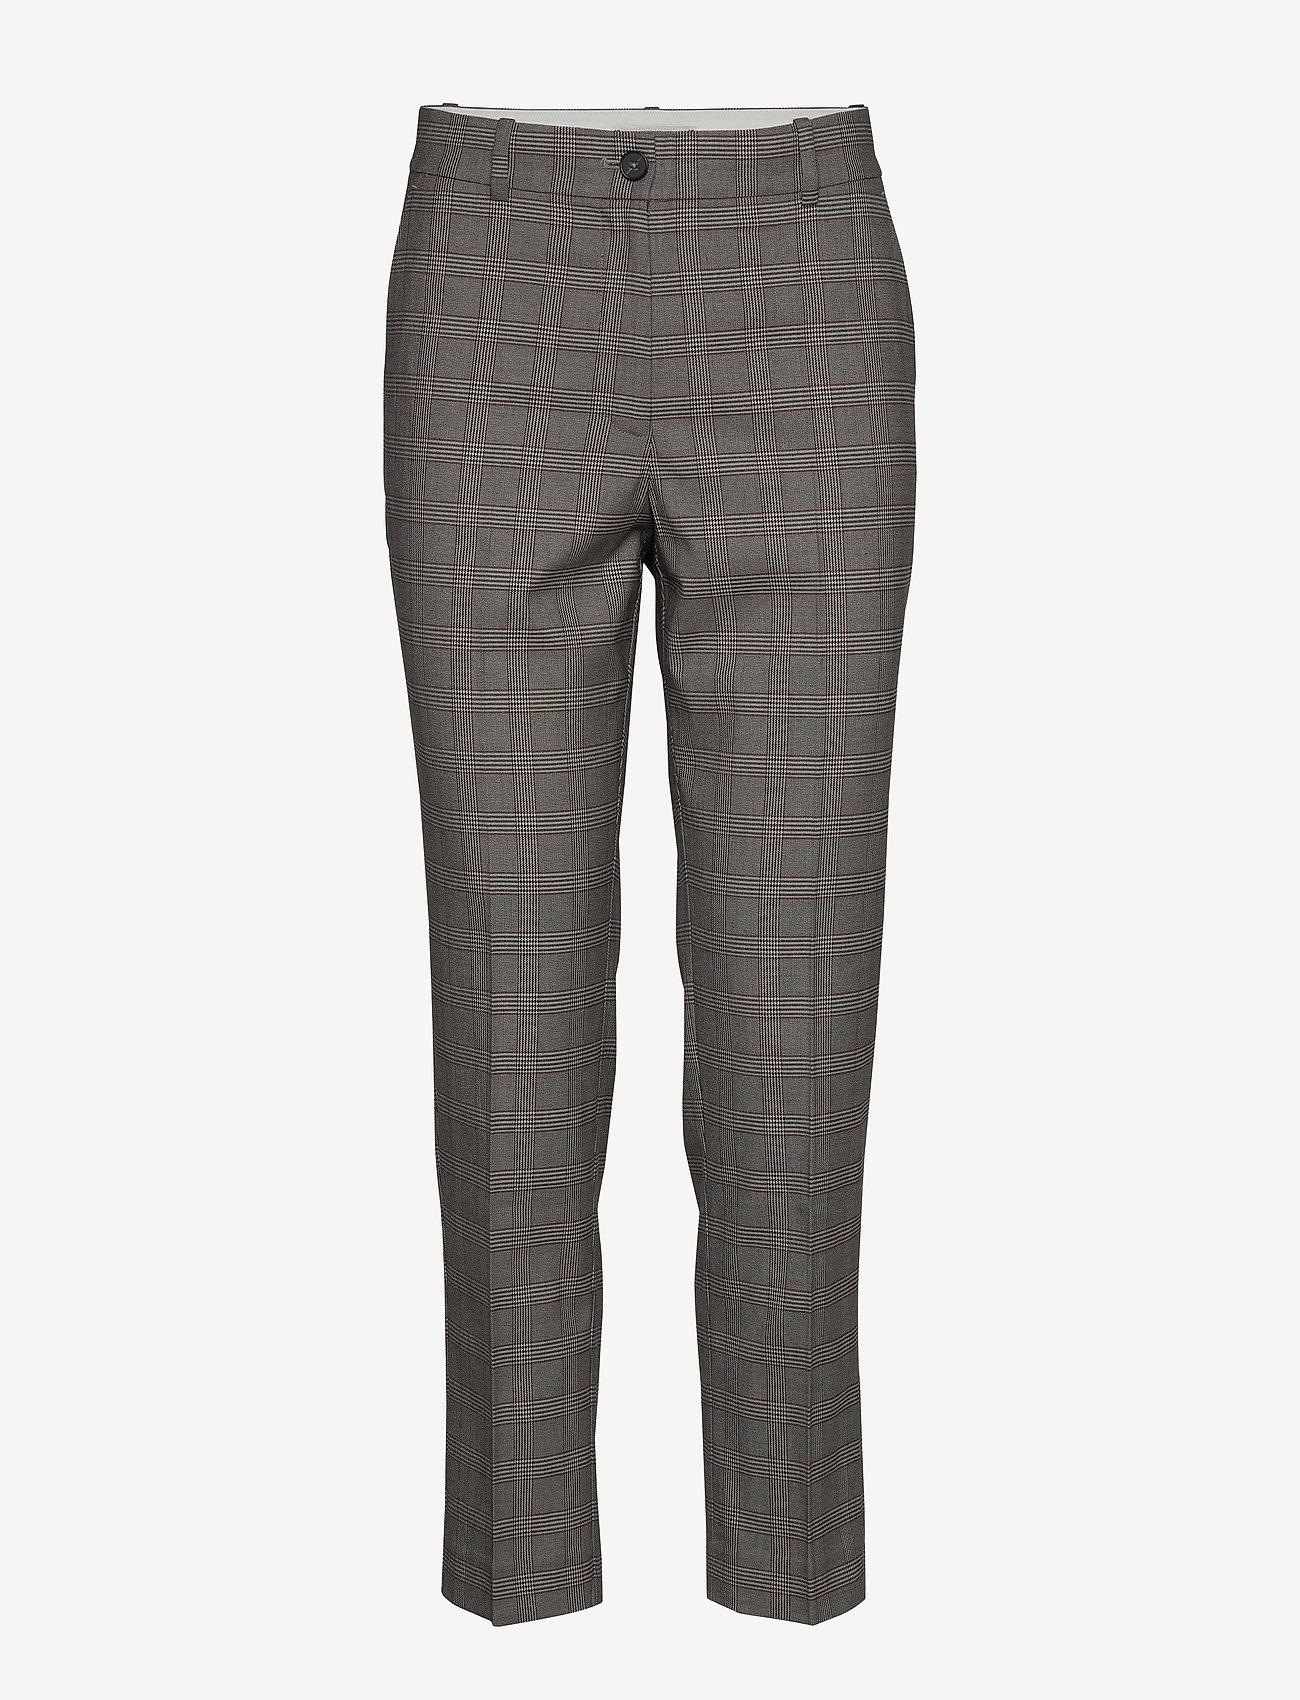 Tommy Hilfiger - Y/D POW CHECK SLIM AL PANT - straight leg trousers - cw check black small scale - 0